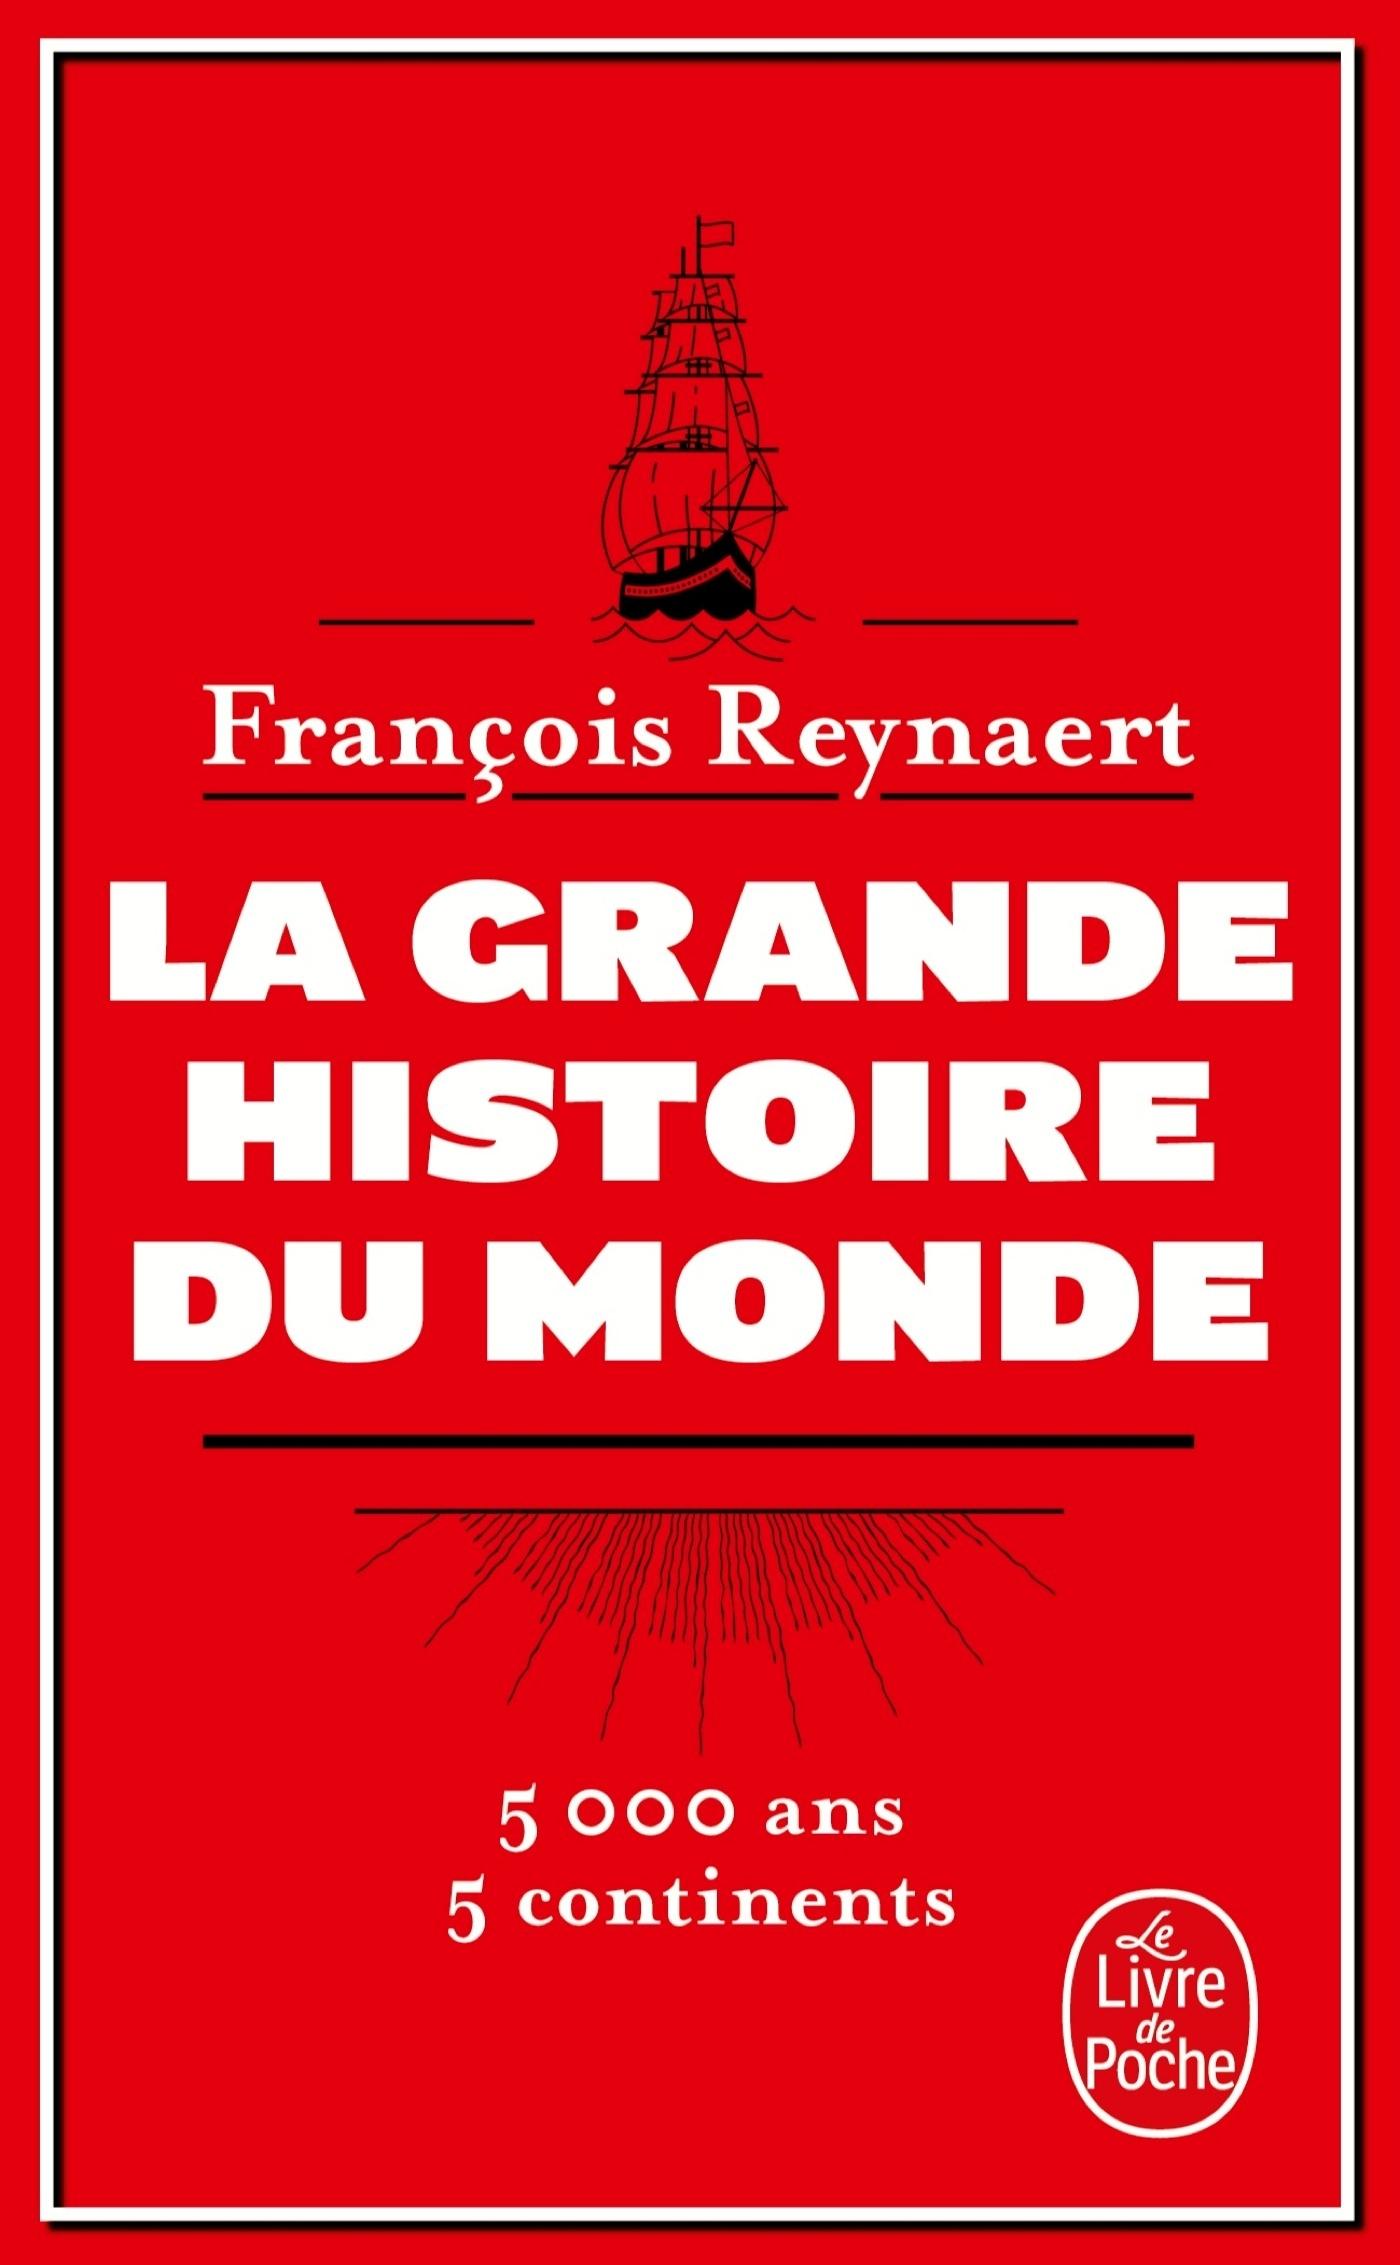 LA GRANDE HISTOIRE DU MONDE